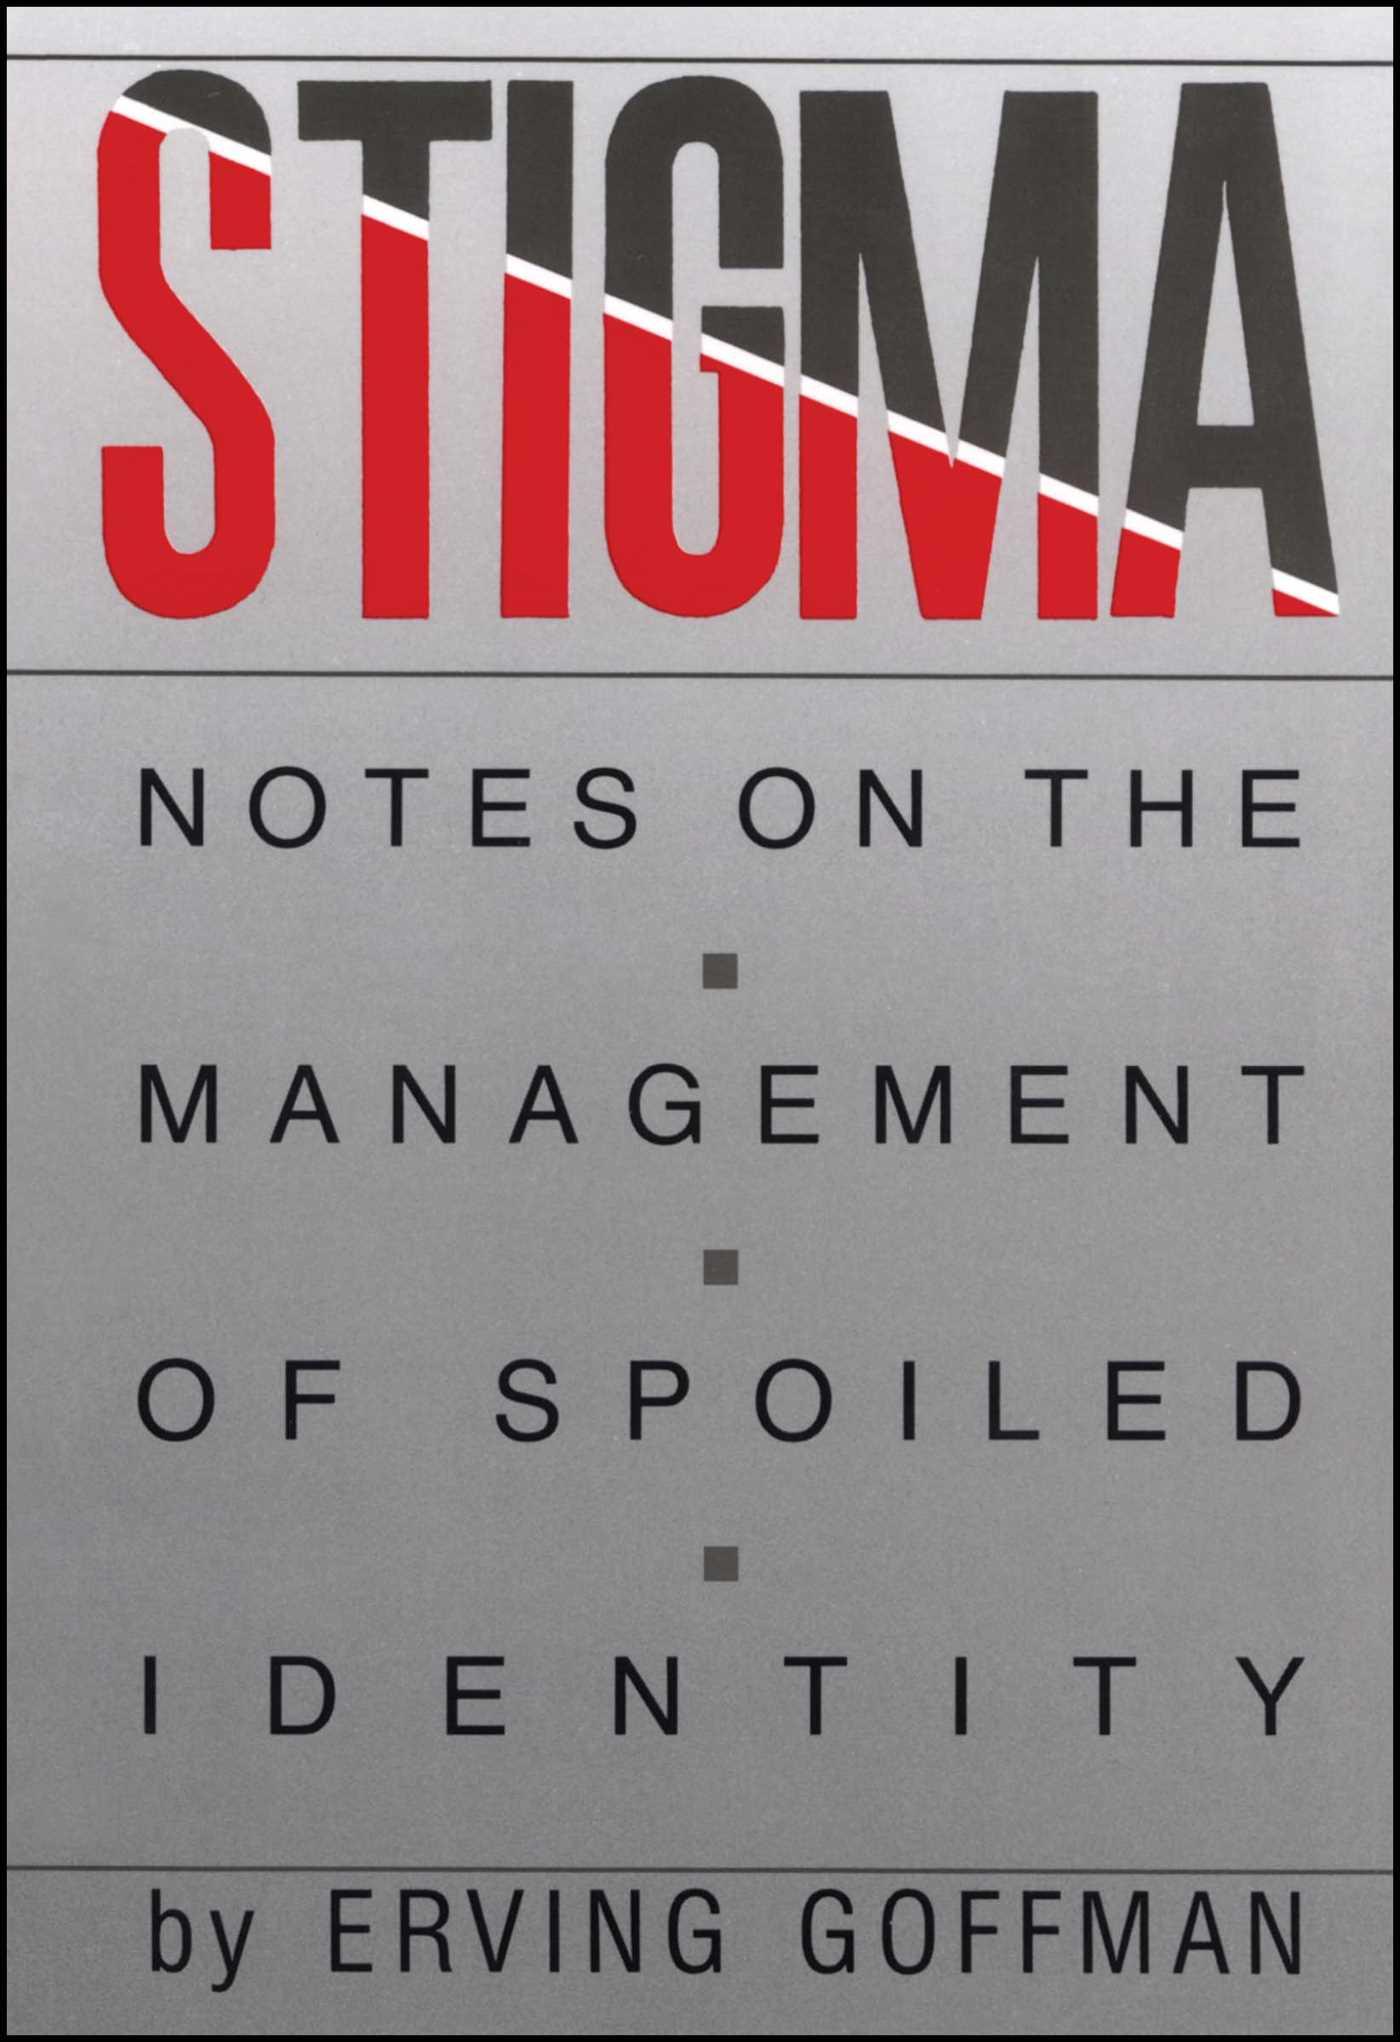 Stigma 9780671622442 hr